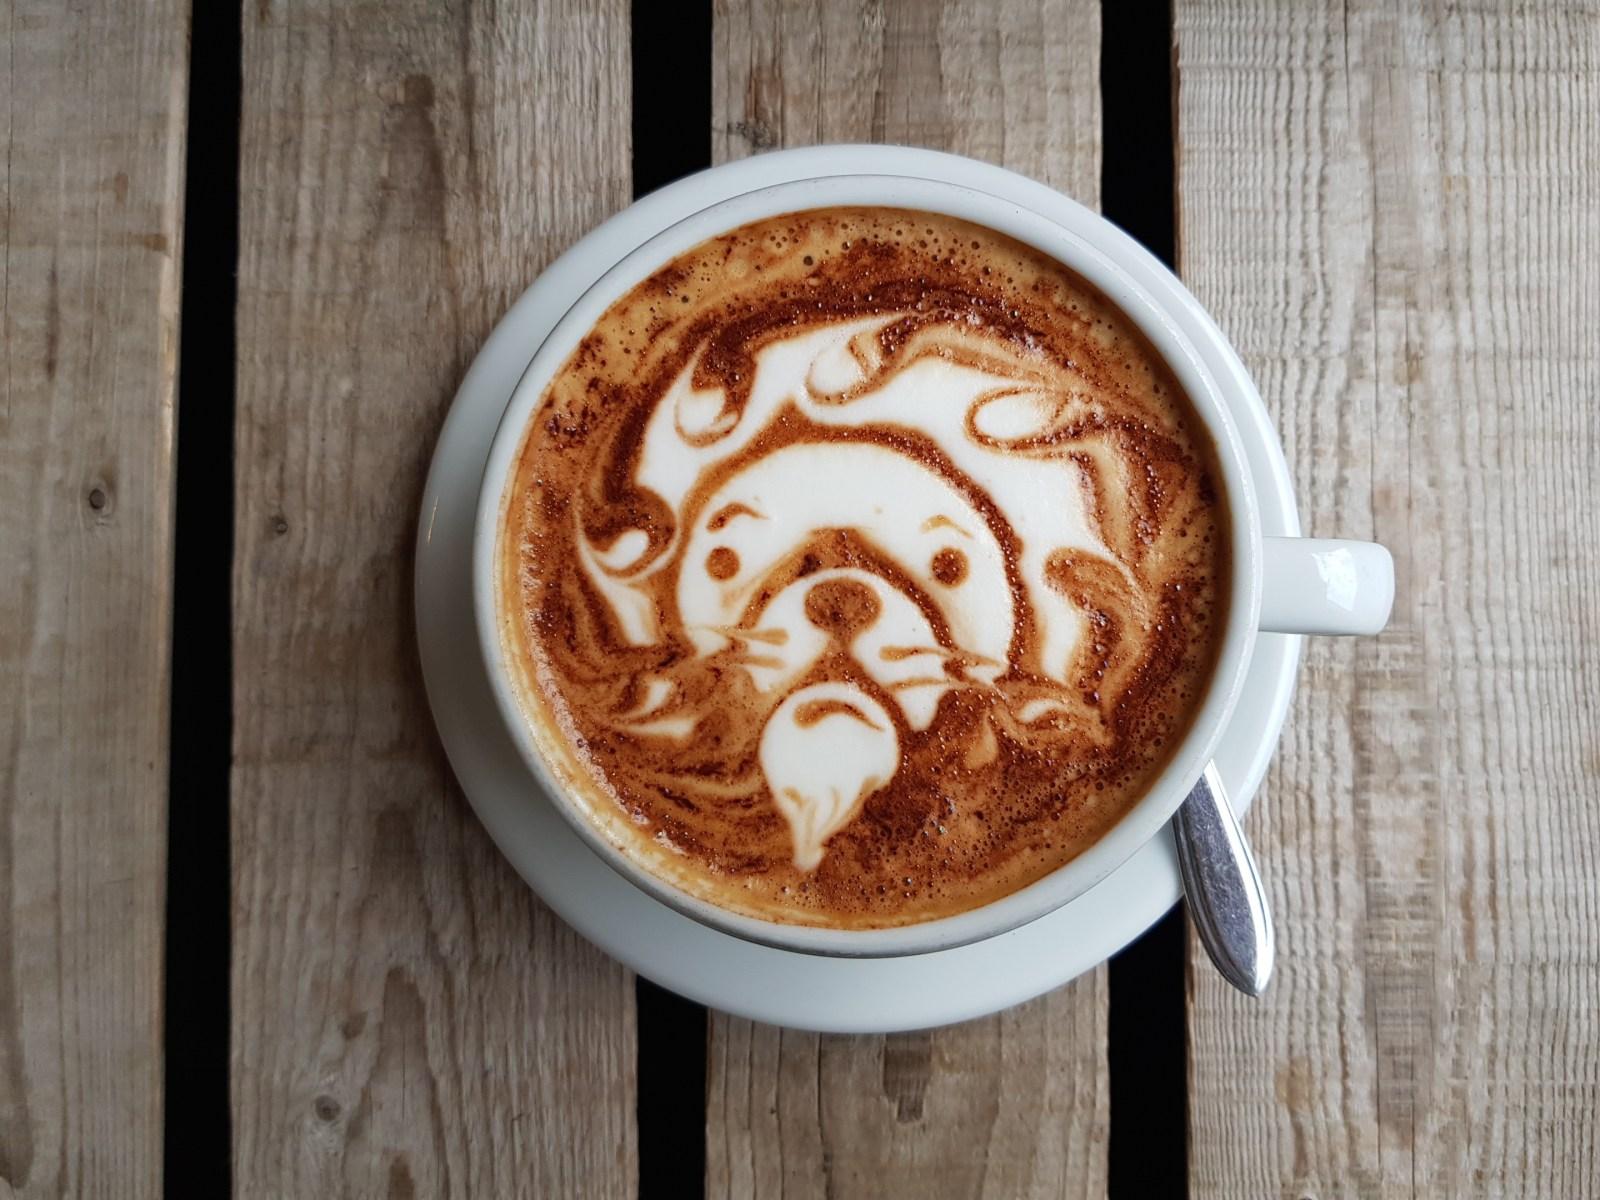 De mooiste latte art van Amsterdam